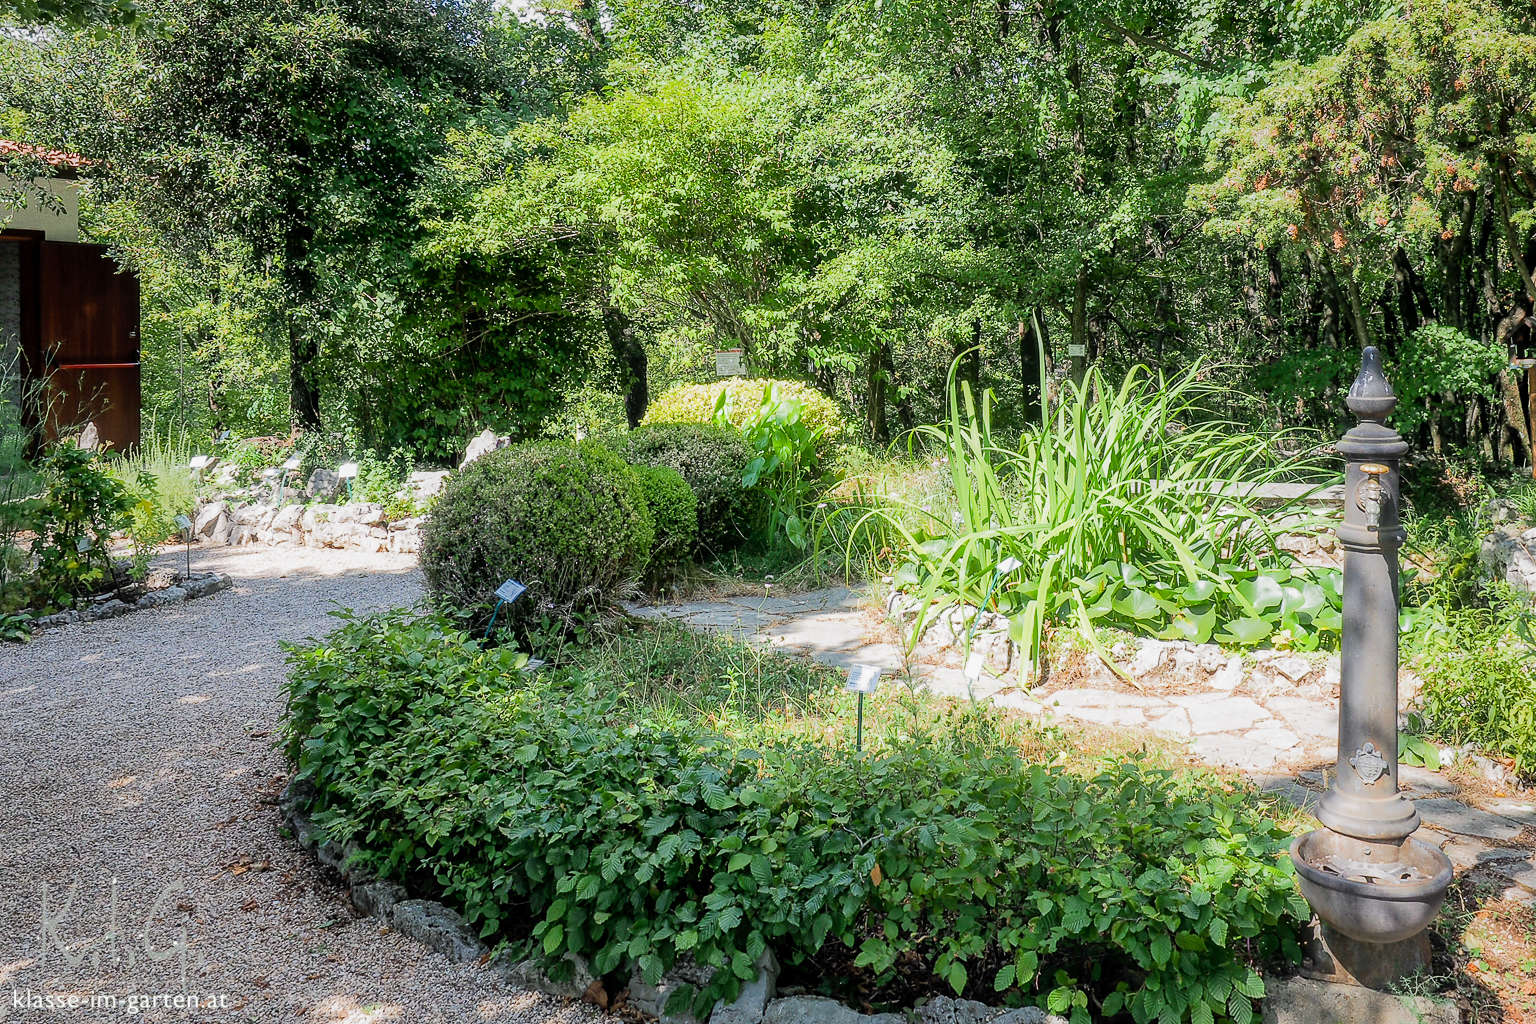 Giardino Botanico Carsiana- viel Garten im Eingangsbereich